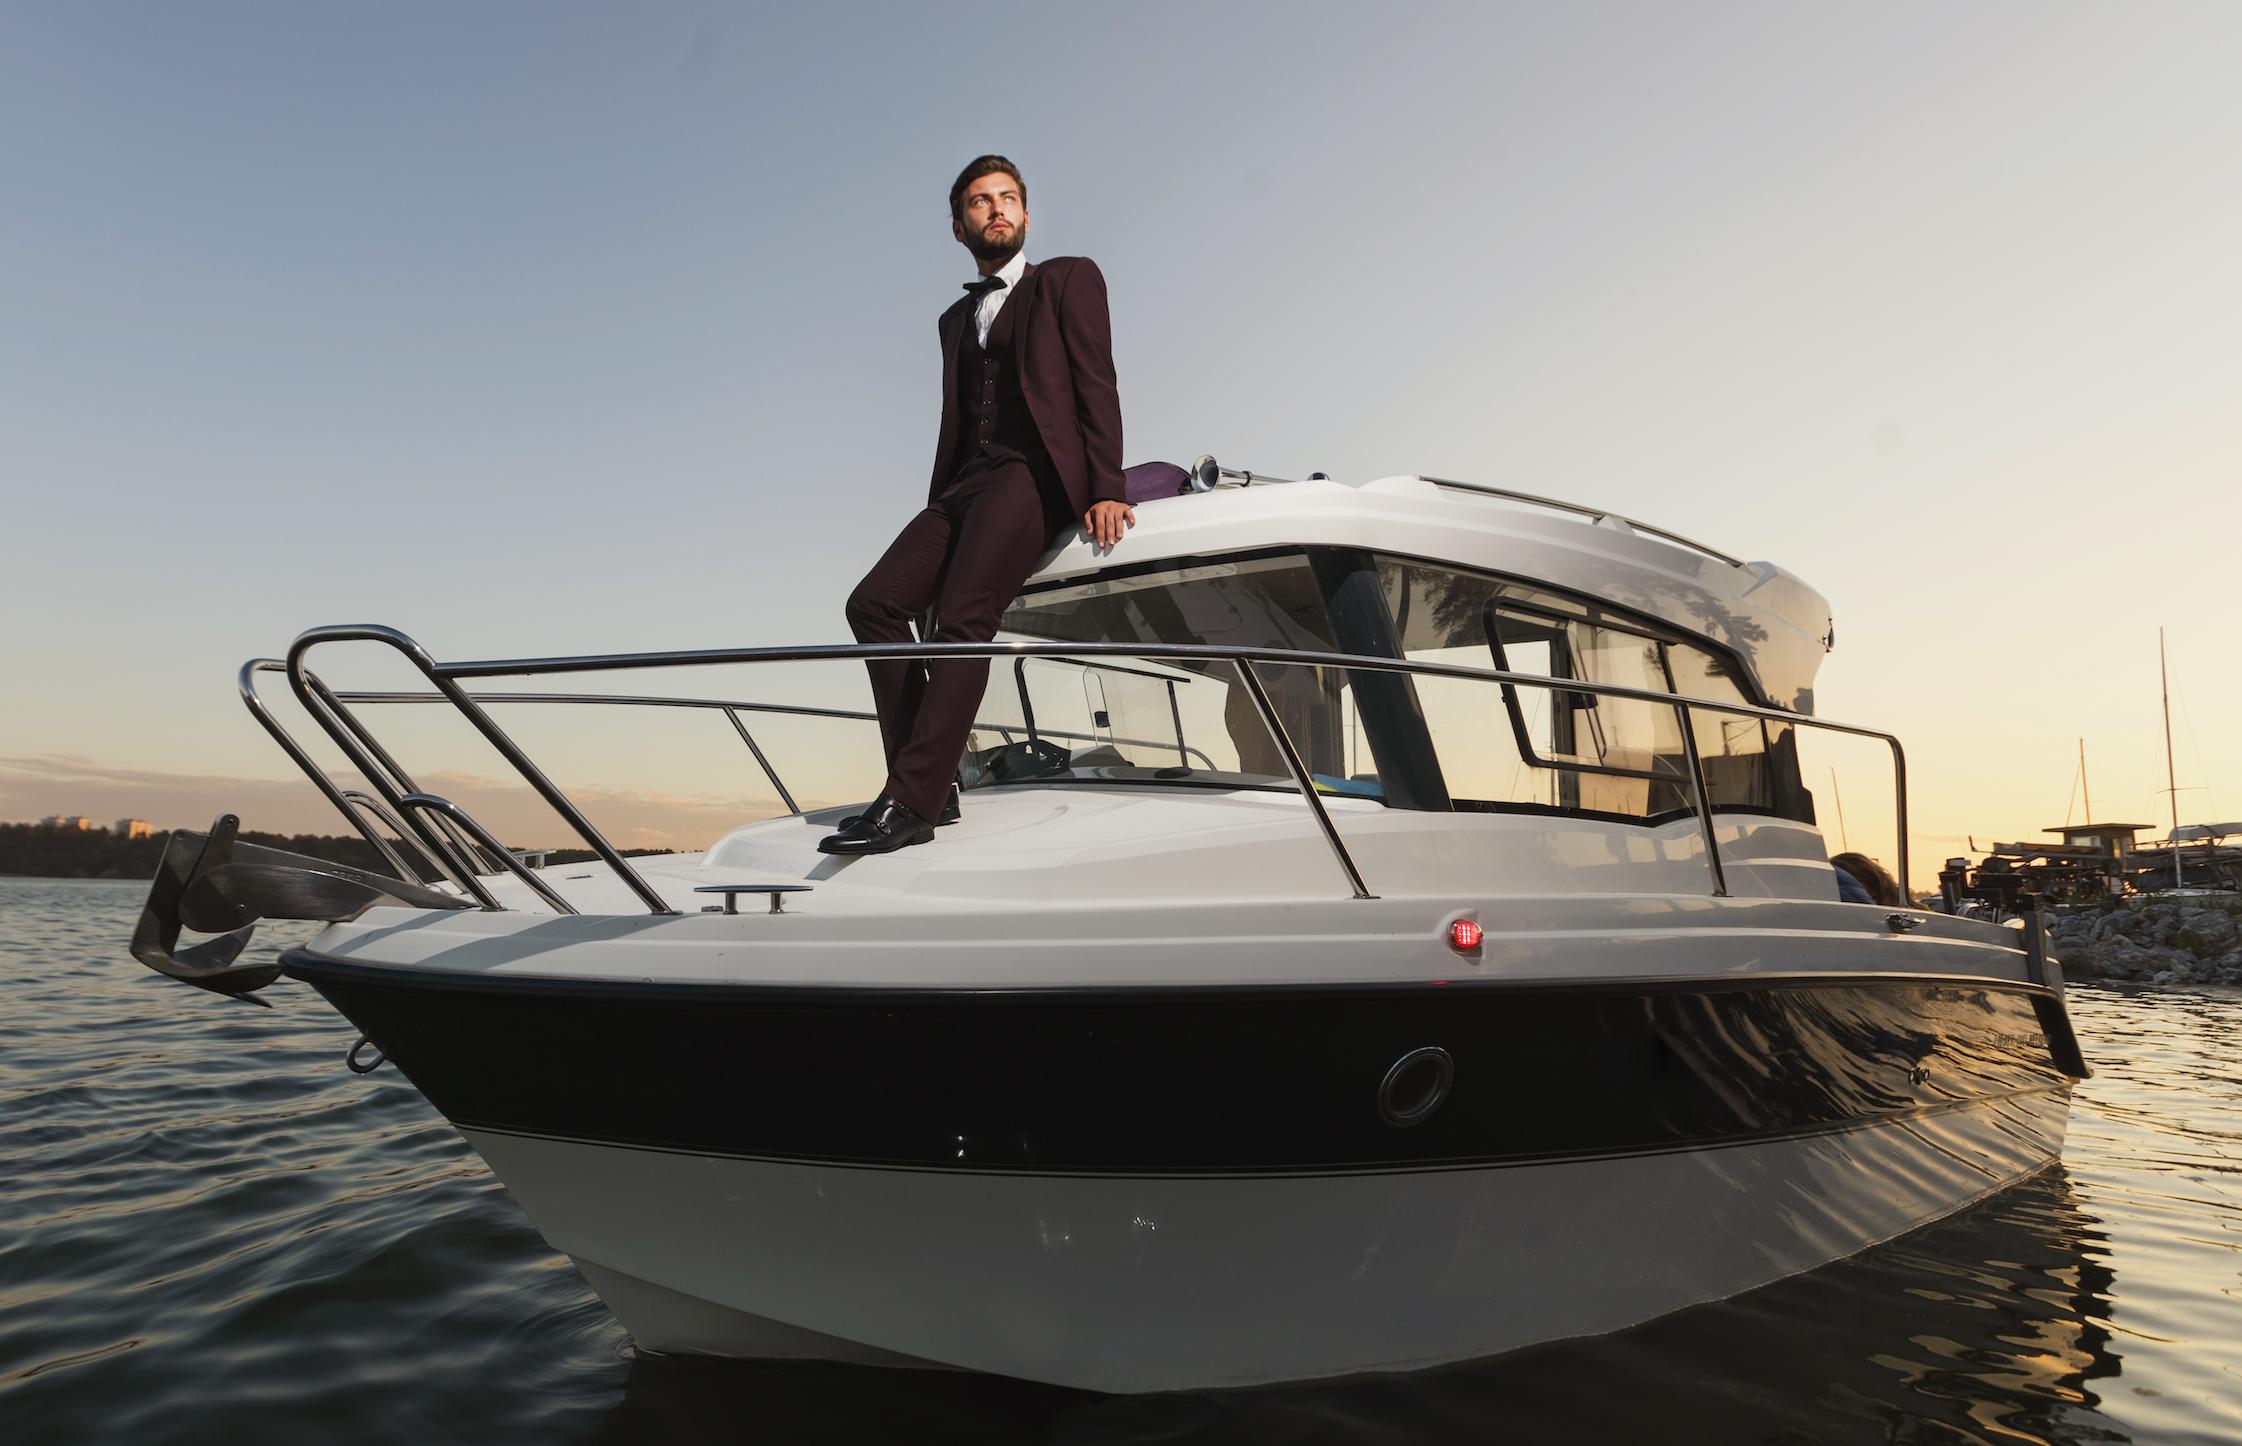 6 factors wealthy people have in common